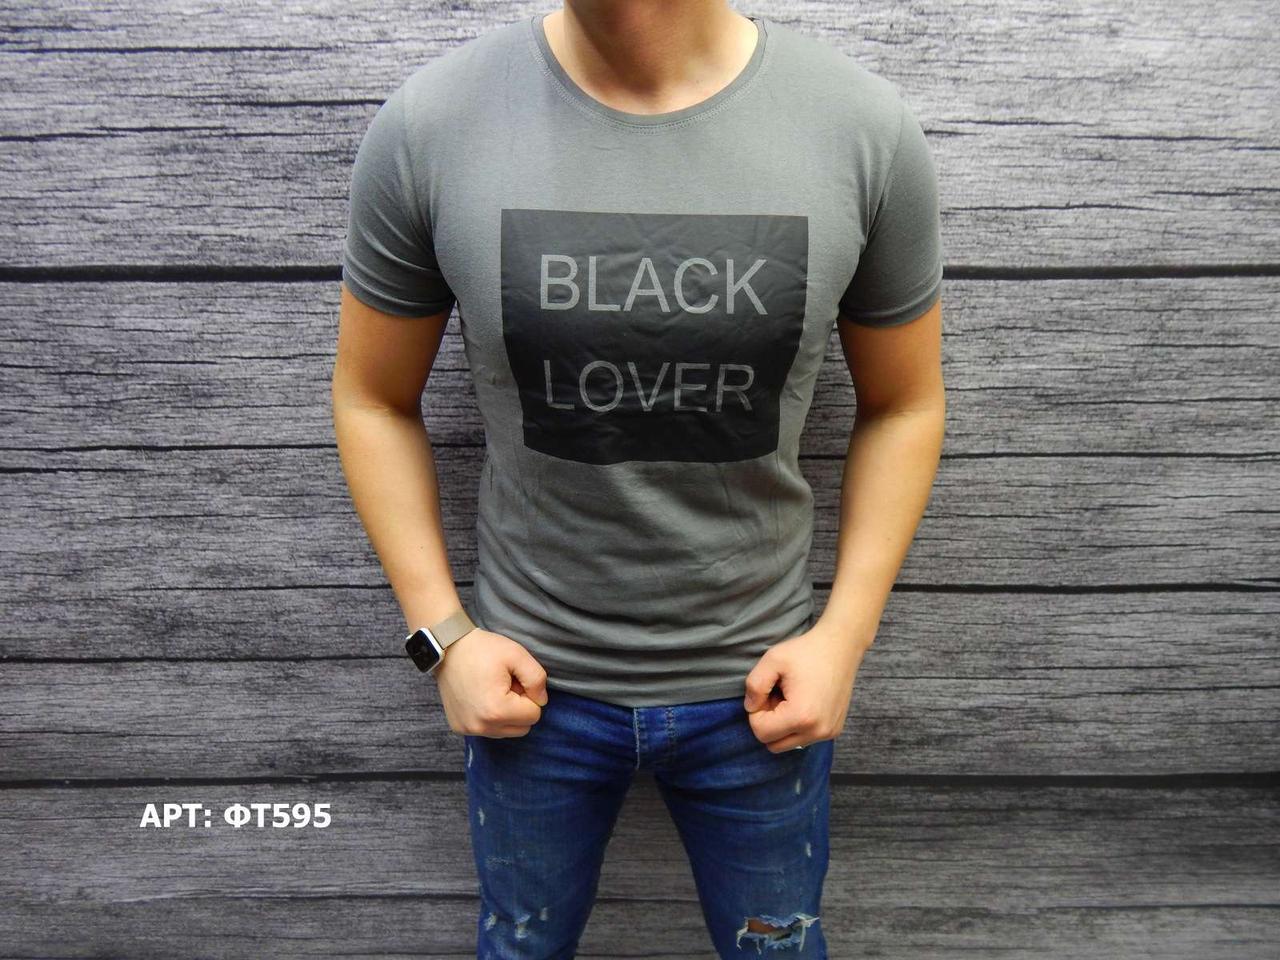 Мужская футболка. Размеры: М, L, XL, 2XL